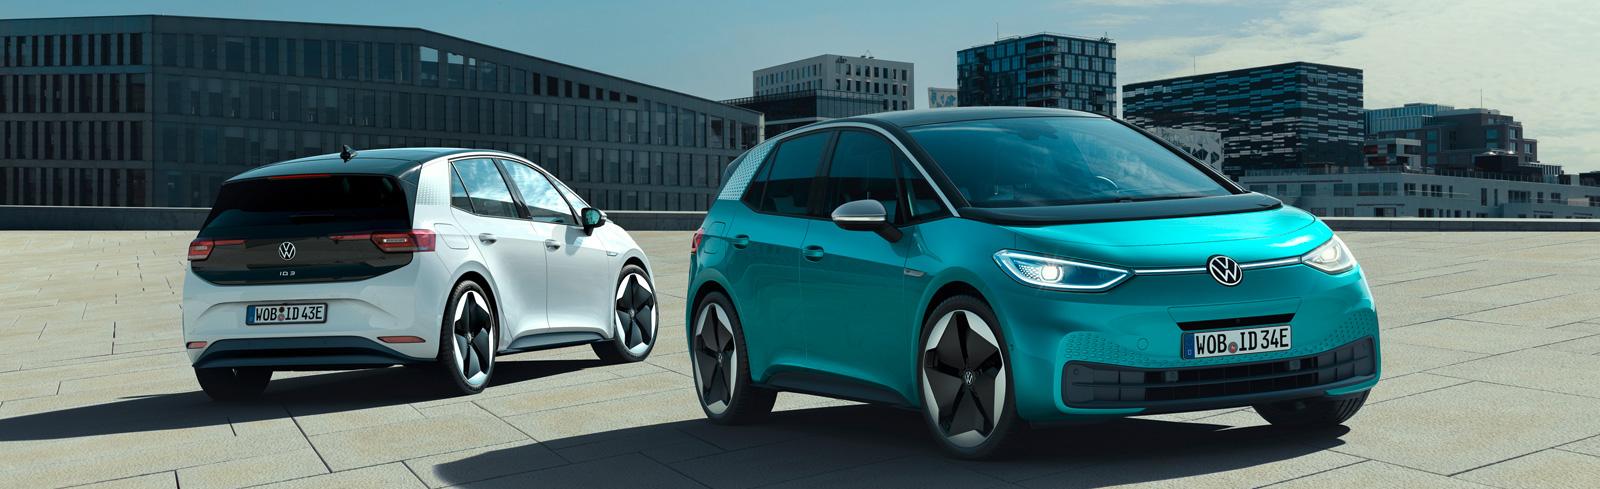 Volkswagen ID.3 1st pre-orders start today, deliveries begin in early September